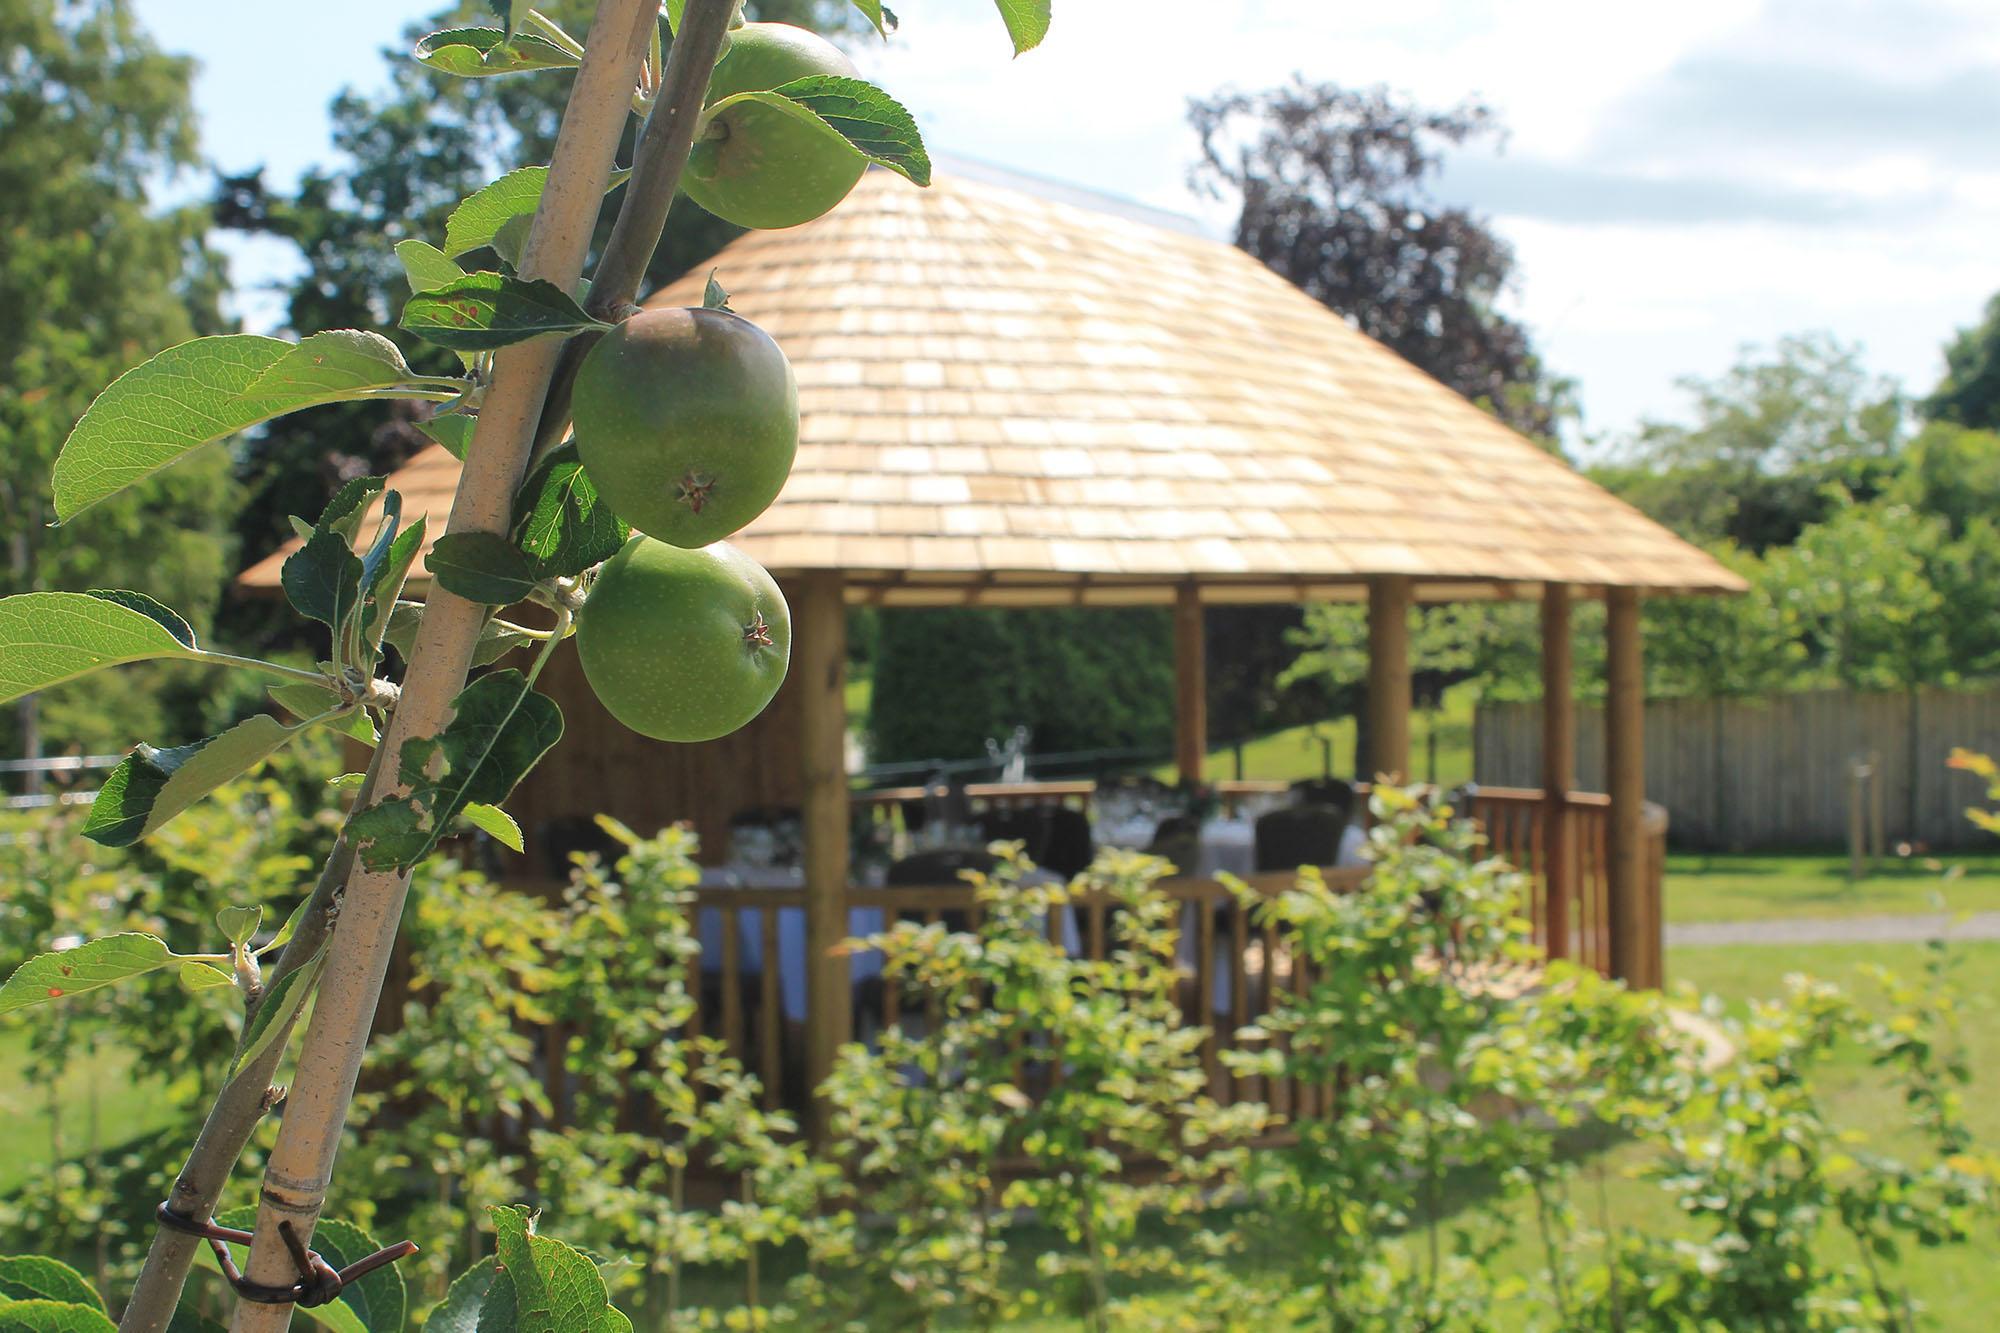 Breeze House overlooking kitchen garden at Rudding Park